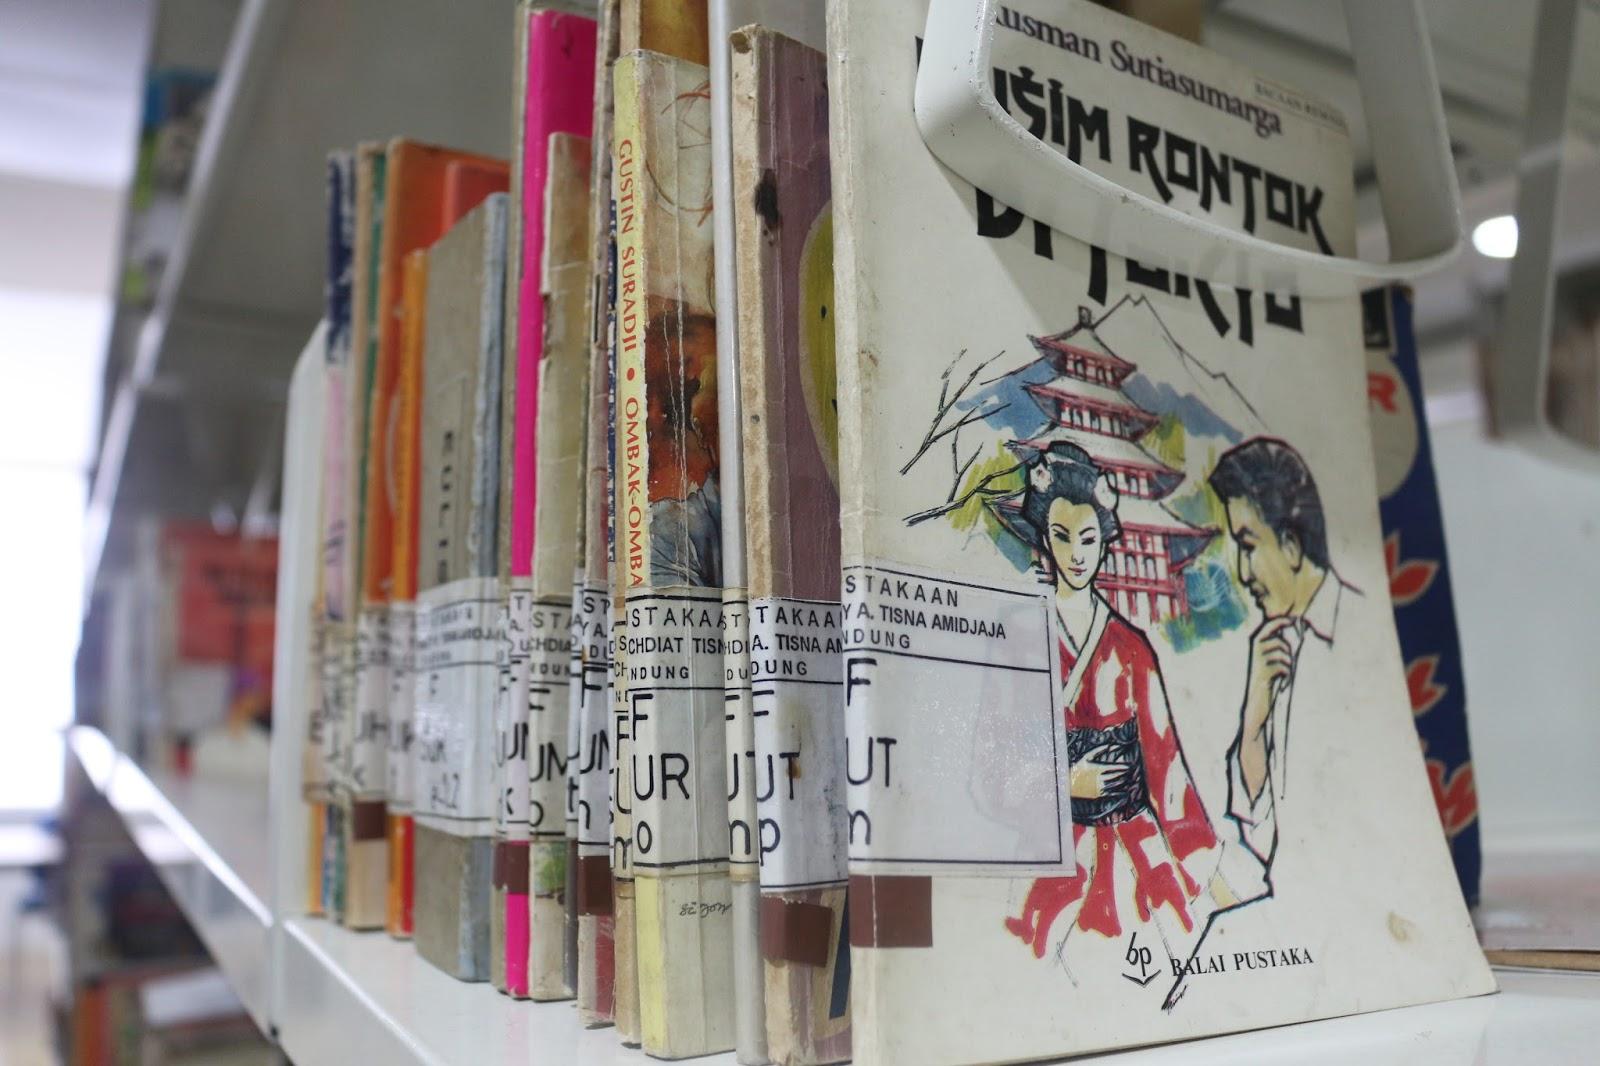 Perpustakaan ITB, Bandung 21 Top Attractions